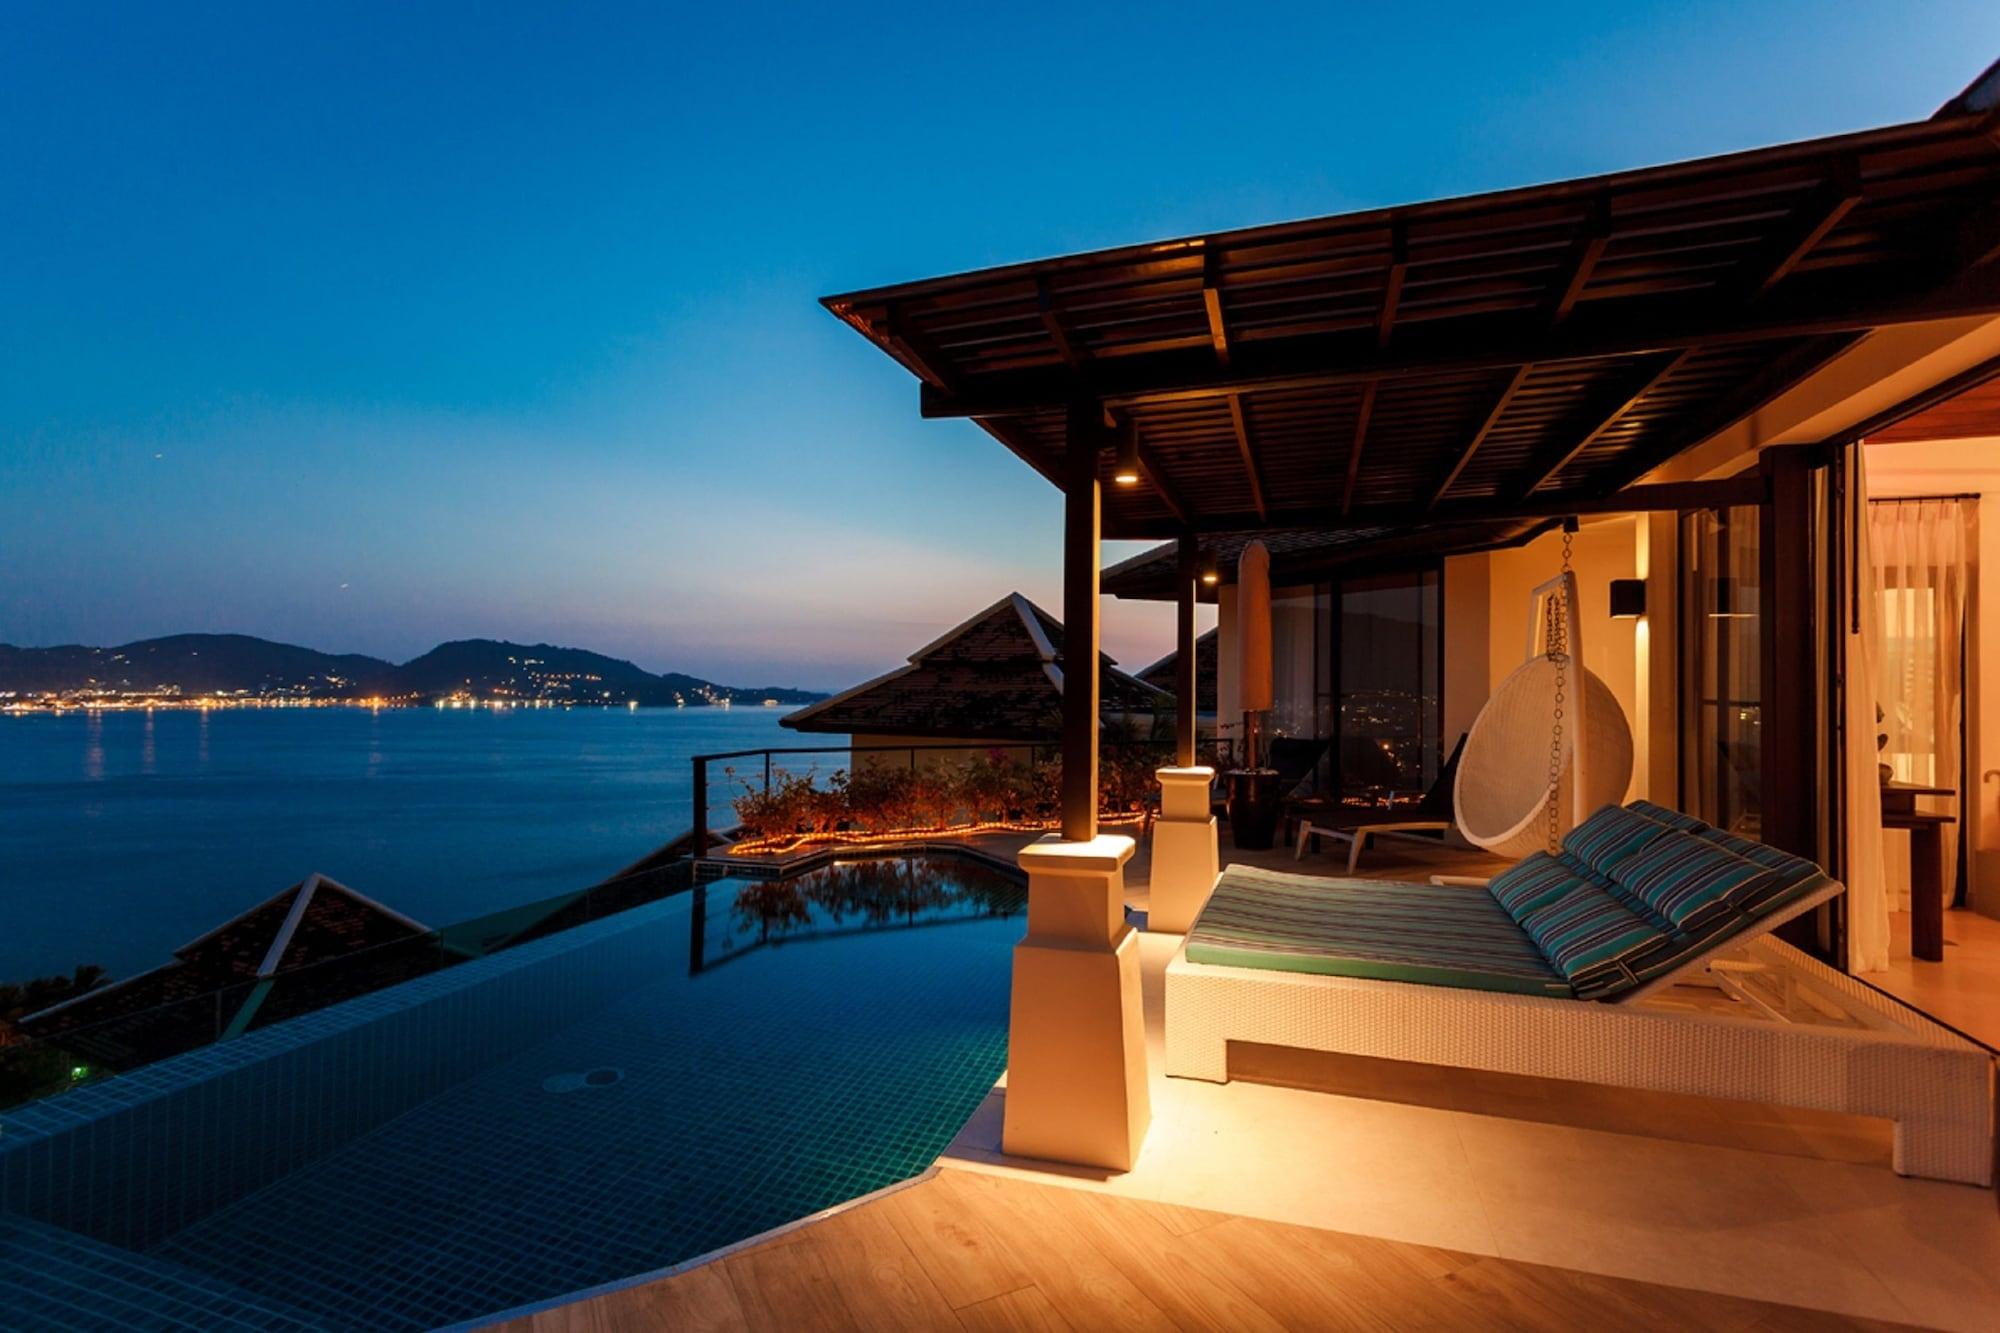 IndoChine Resort & Villas, Pulau Phuket